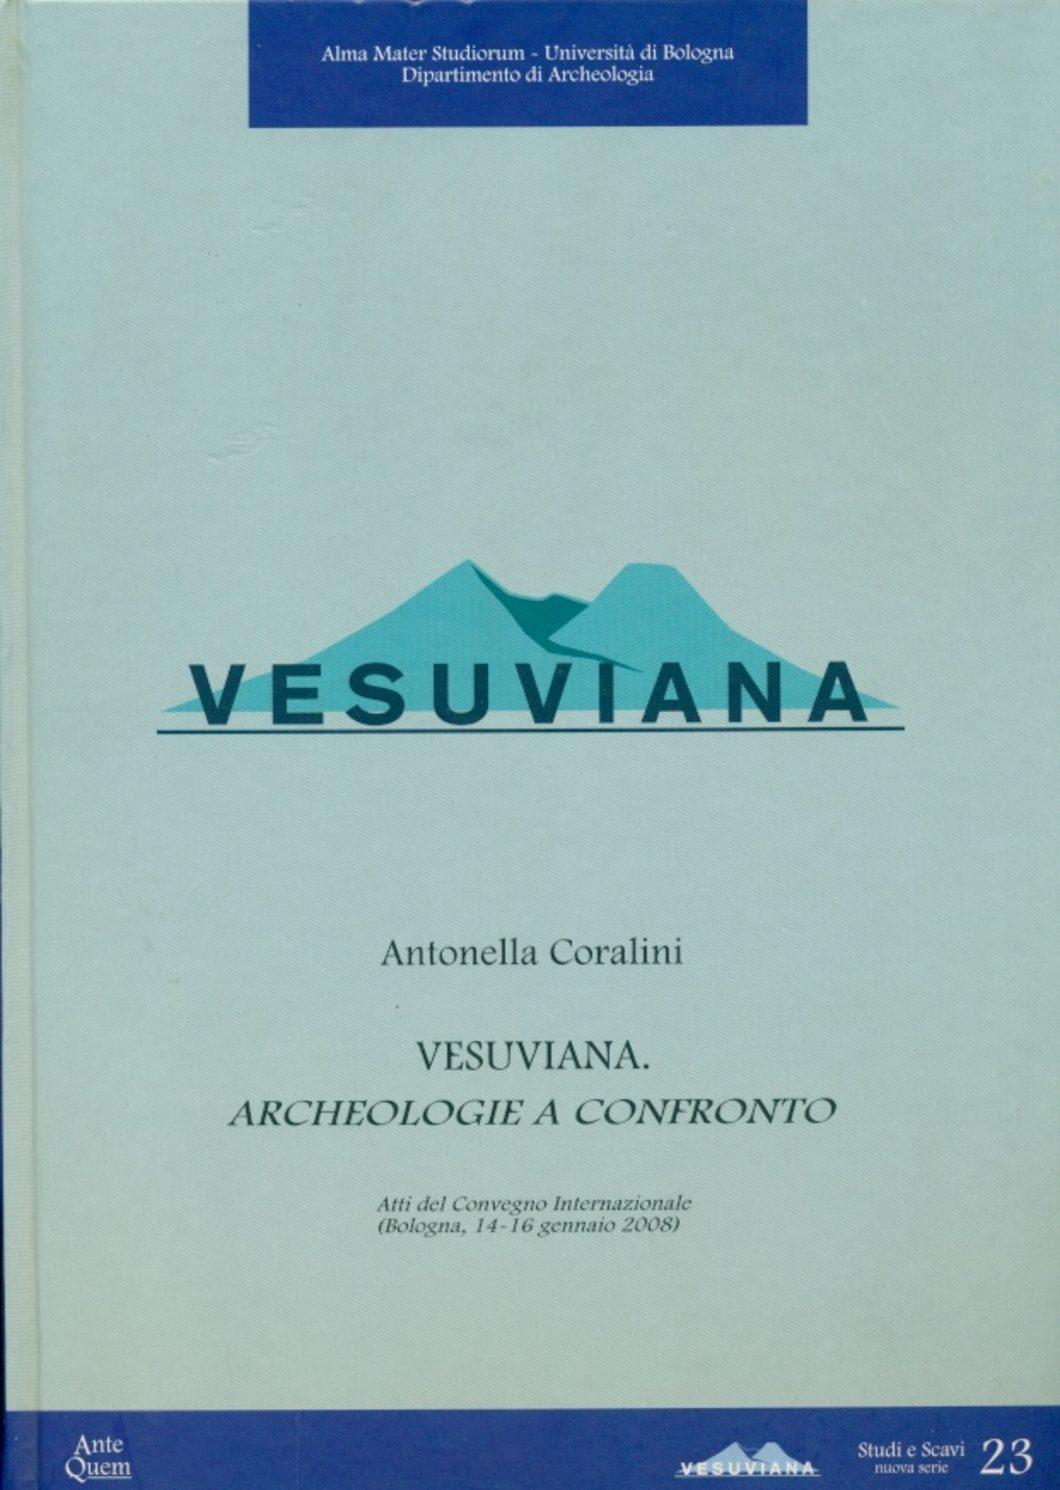 http://cbccoop.it/app/uploads/2017/06/COP-Vettii-Pompei-pdf.jpg